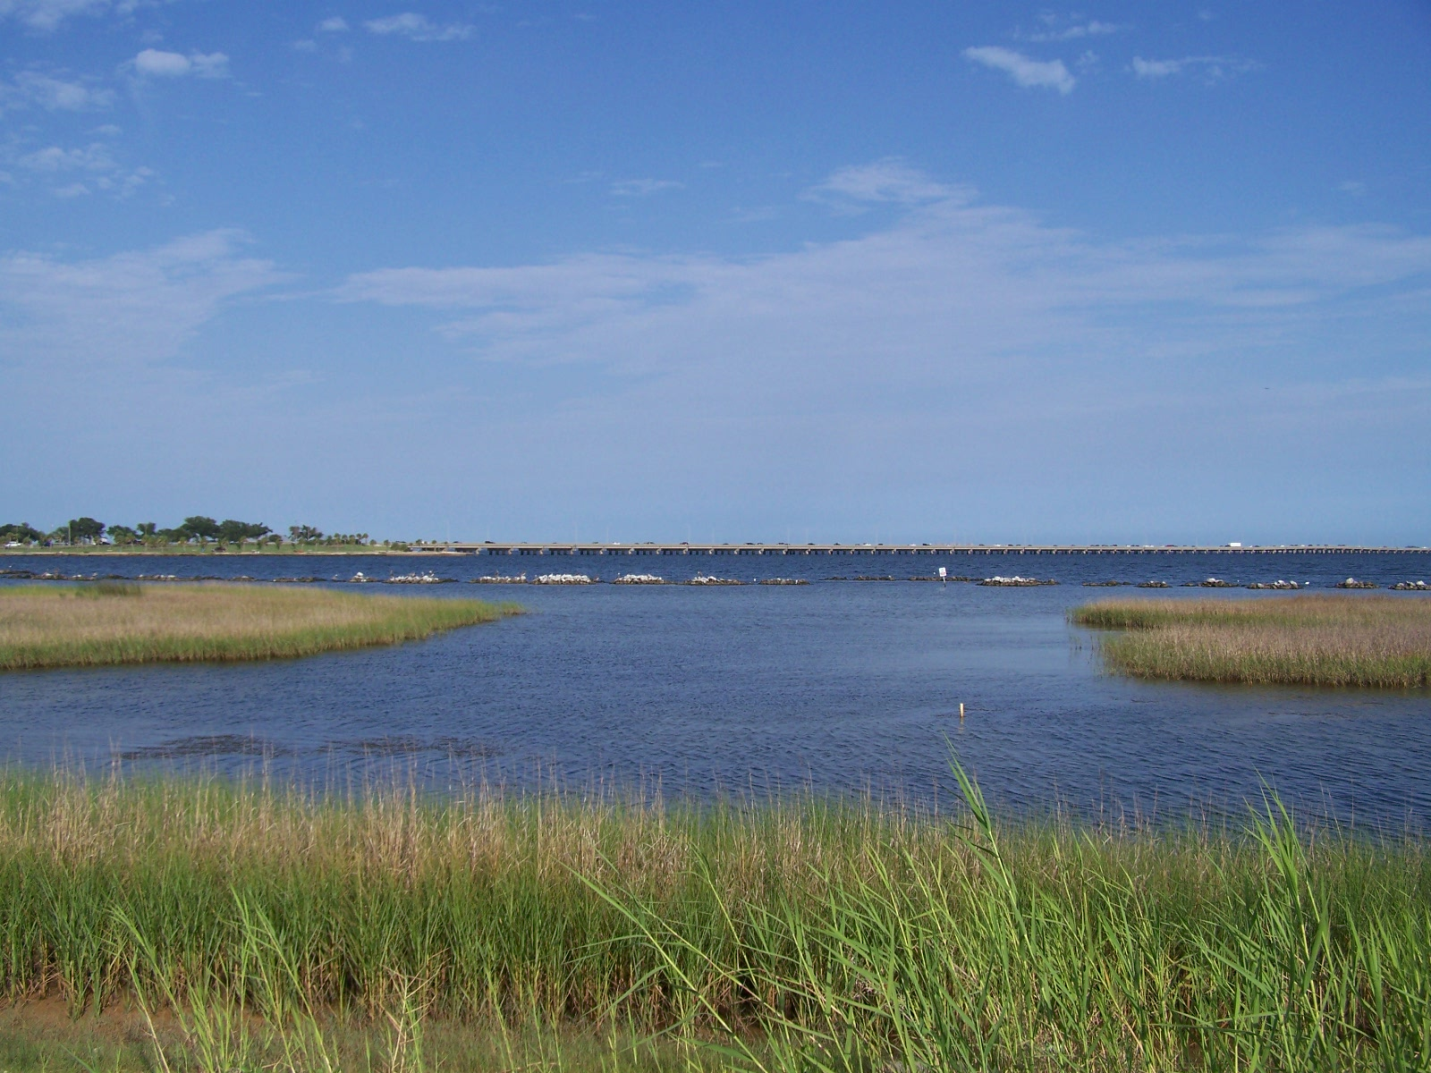 Living shoreline along the Florida Gulf coast.